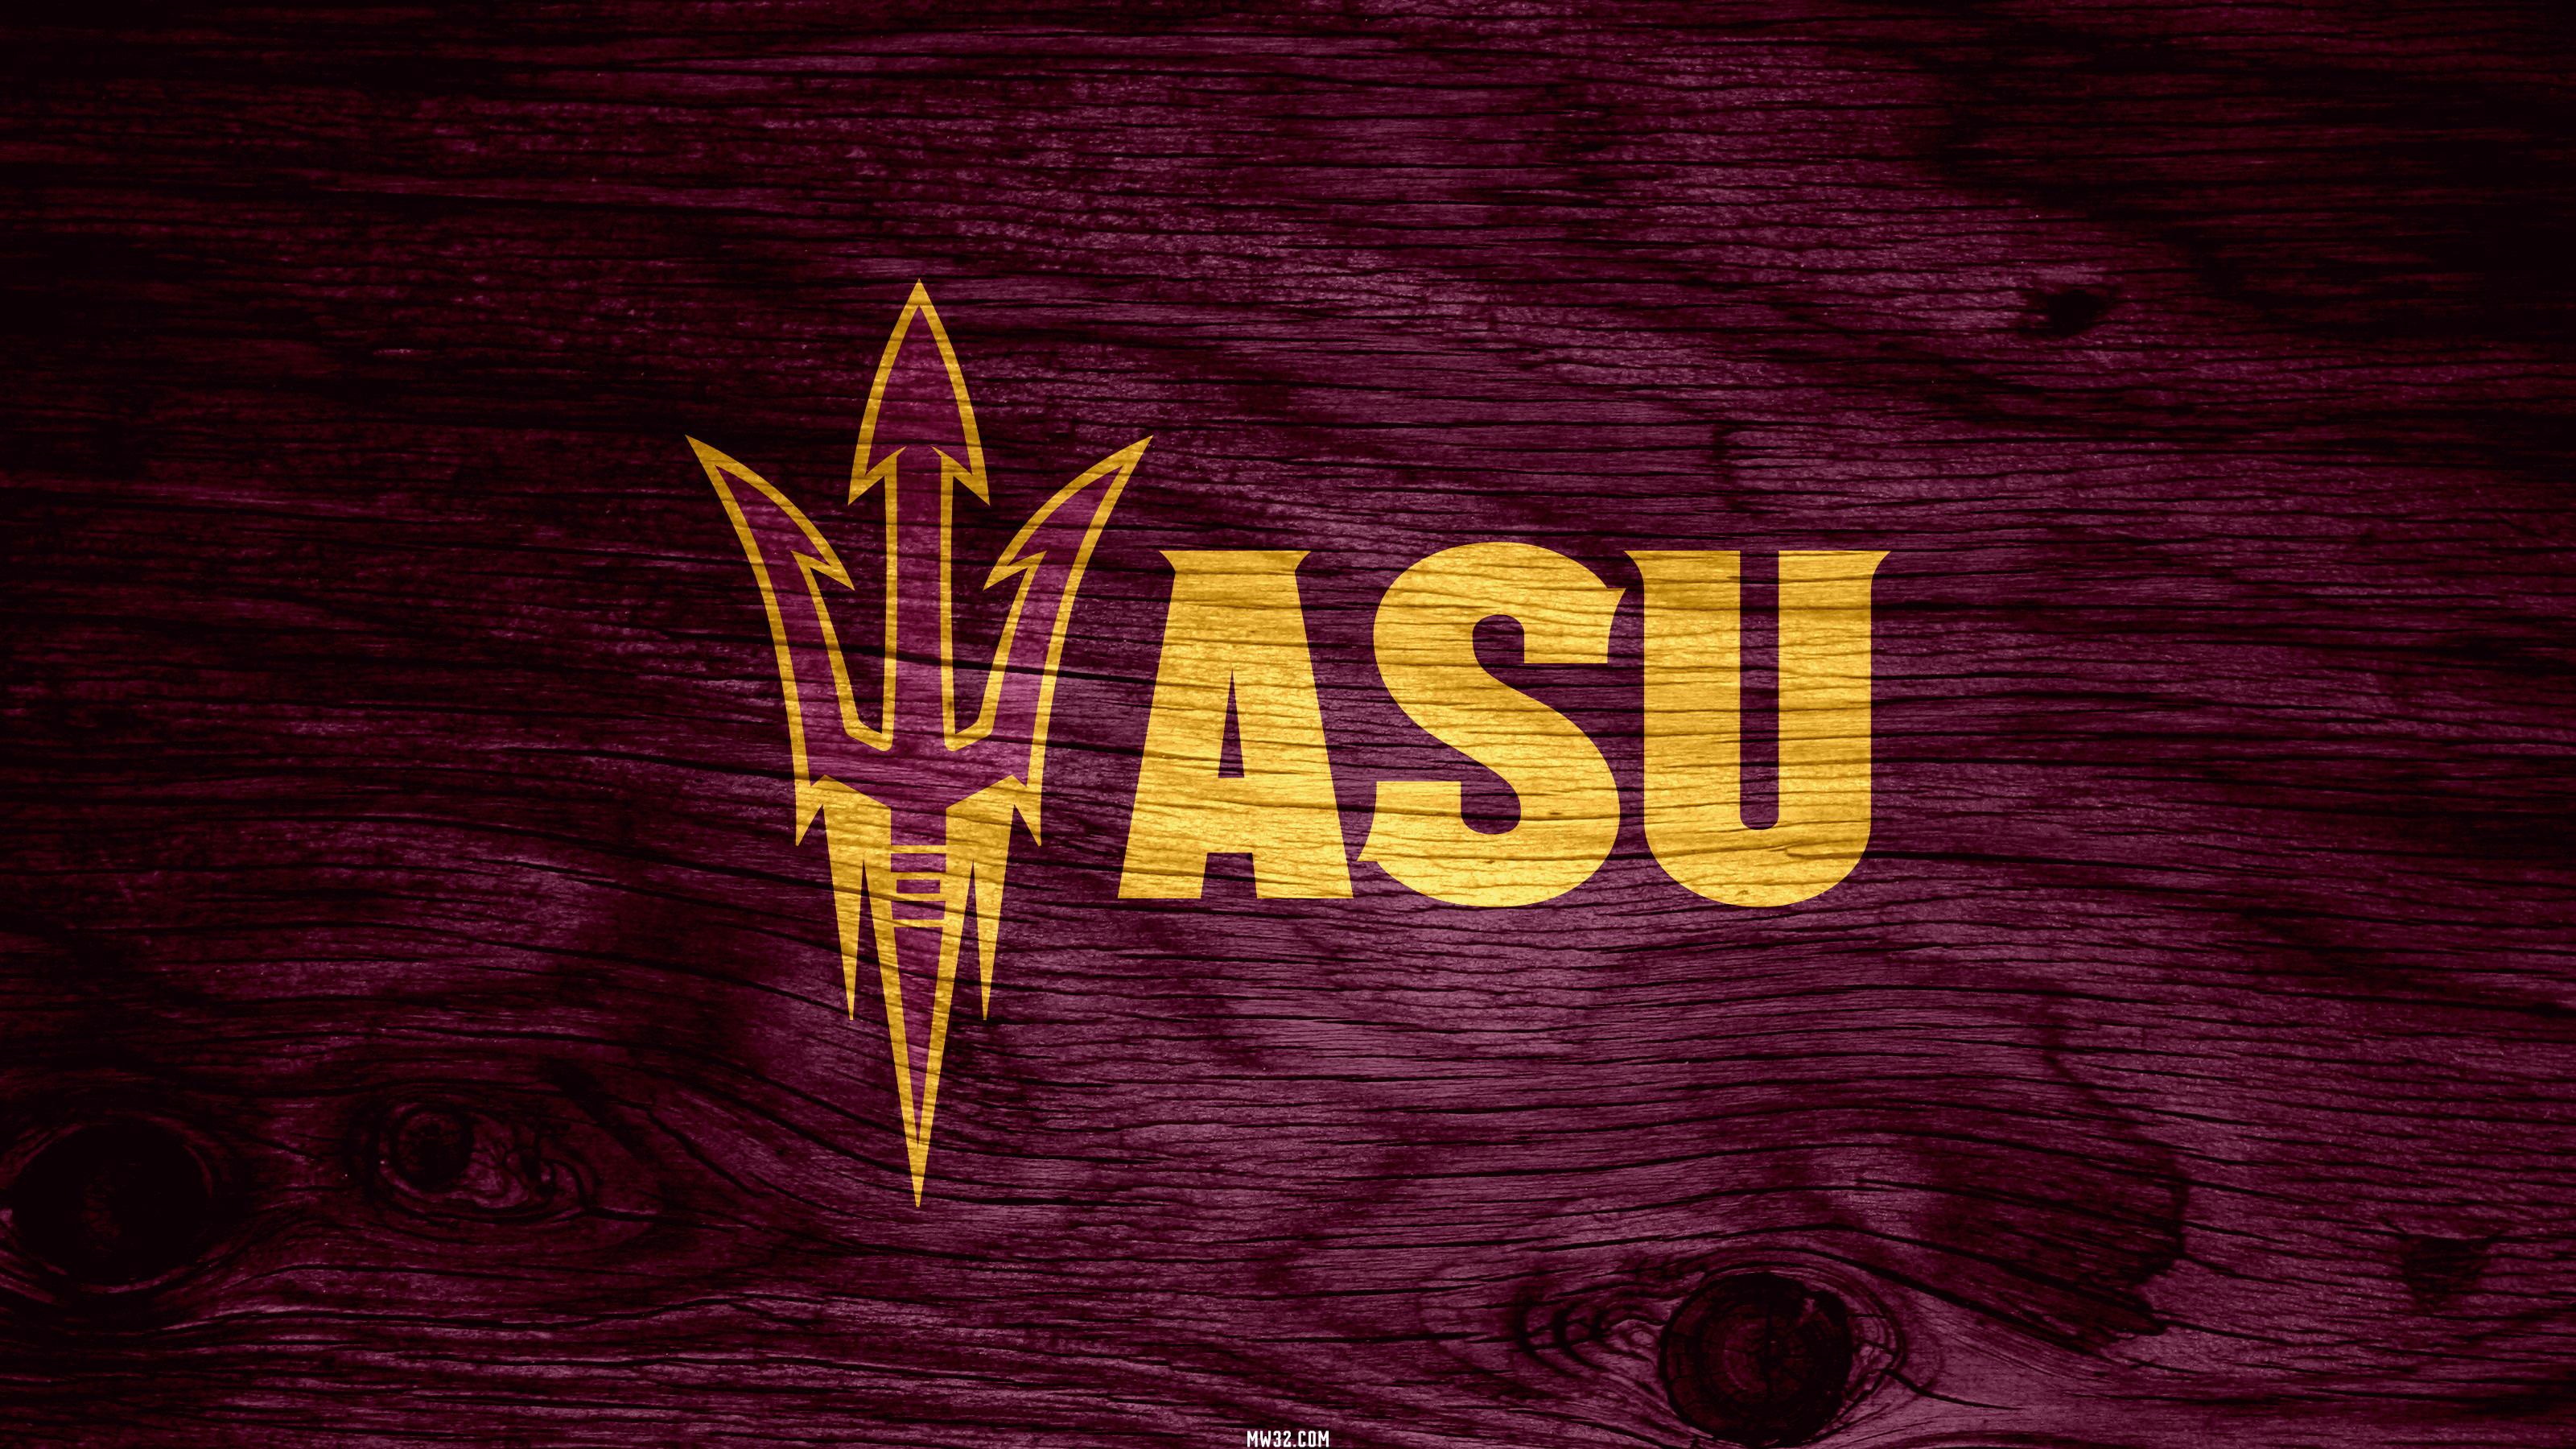 Arizona State University Wallpaper 3201x1800